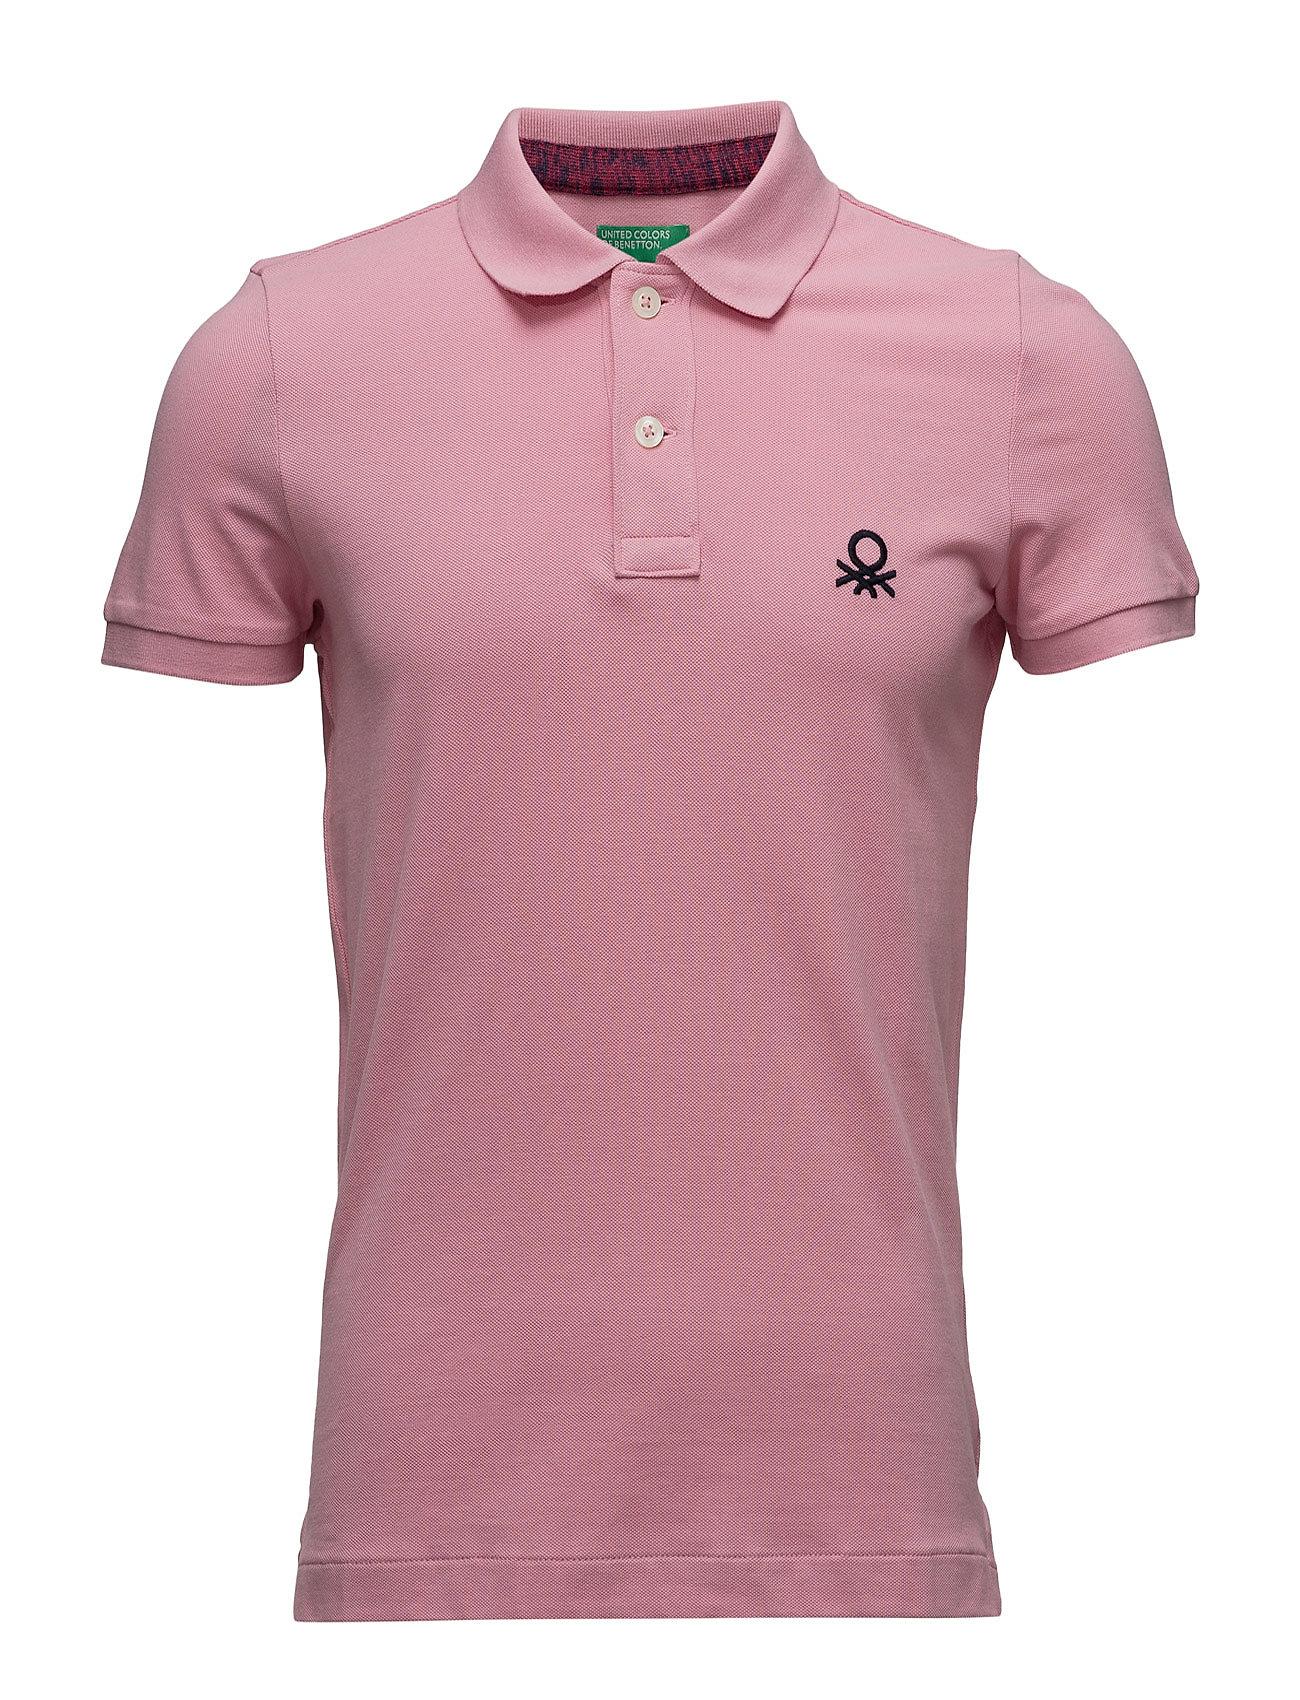 H/S Polo Shirt United Colors of Benetton Kort Ärm Pikétröjor